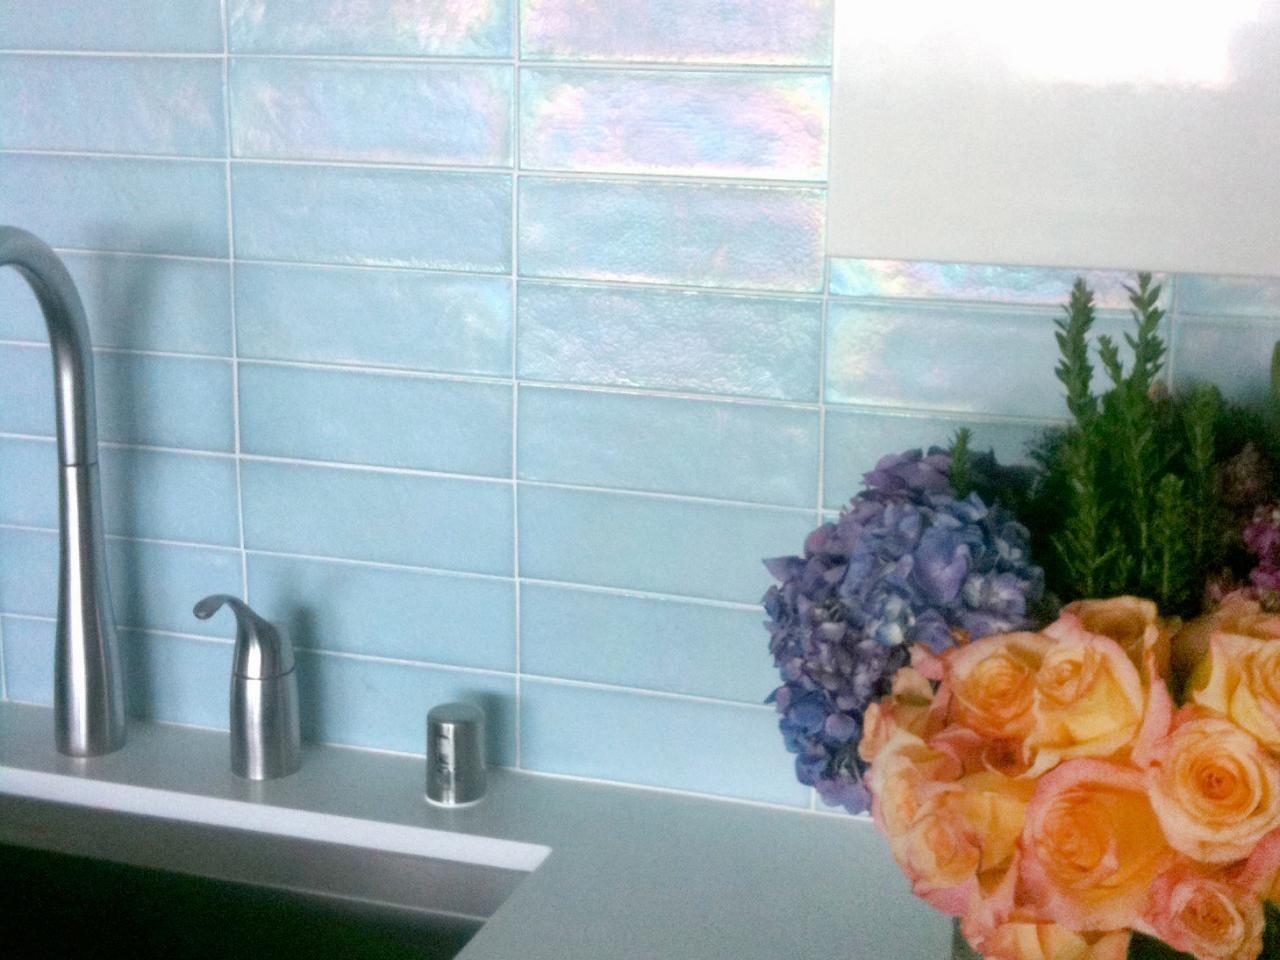 pictures of beautiful kitchen backsplash options & ideas | kitchen